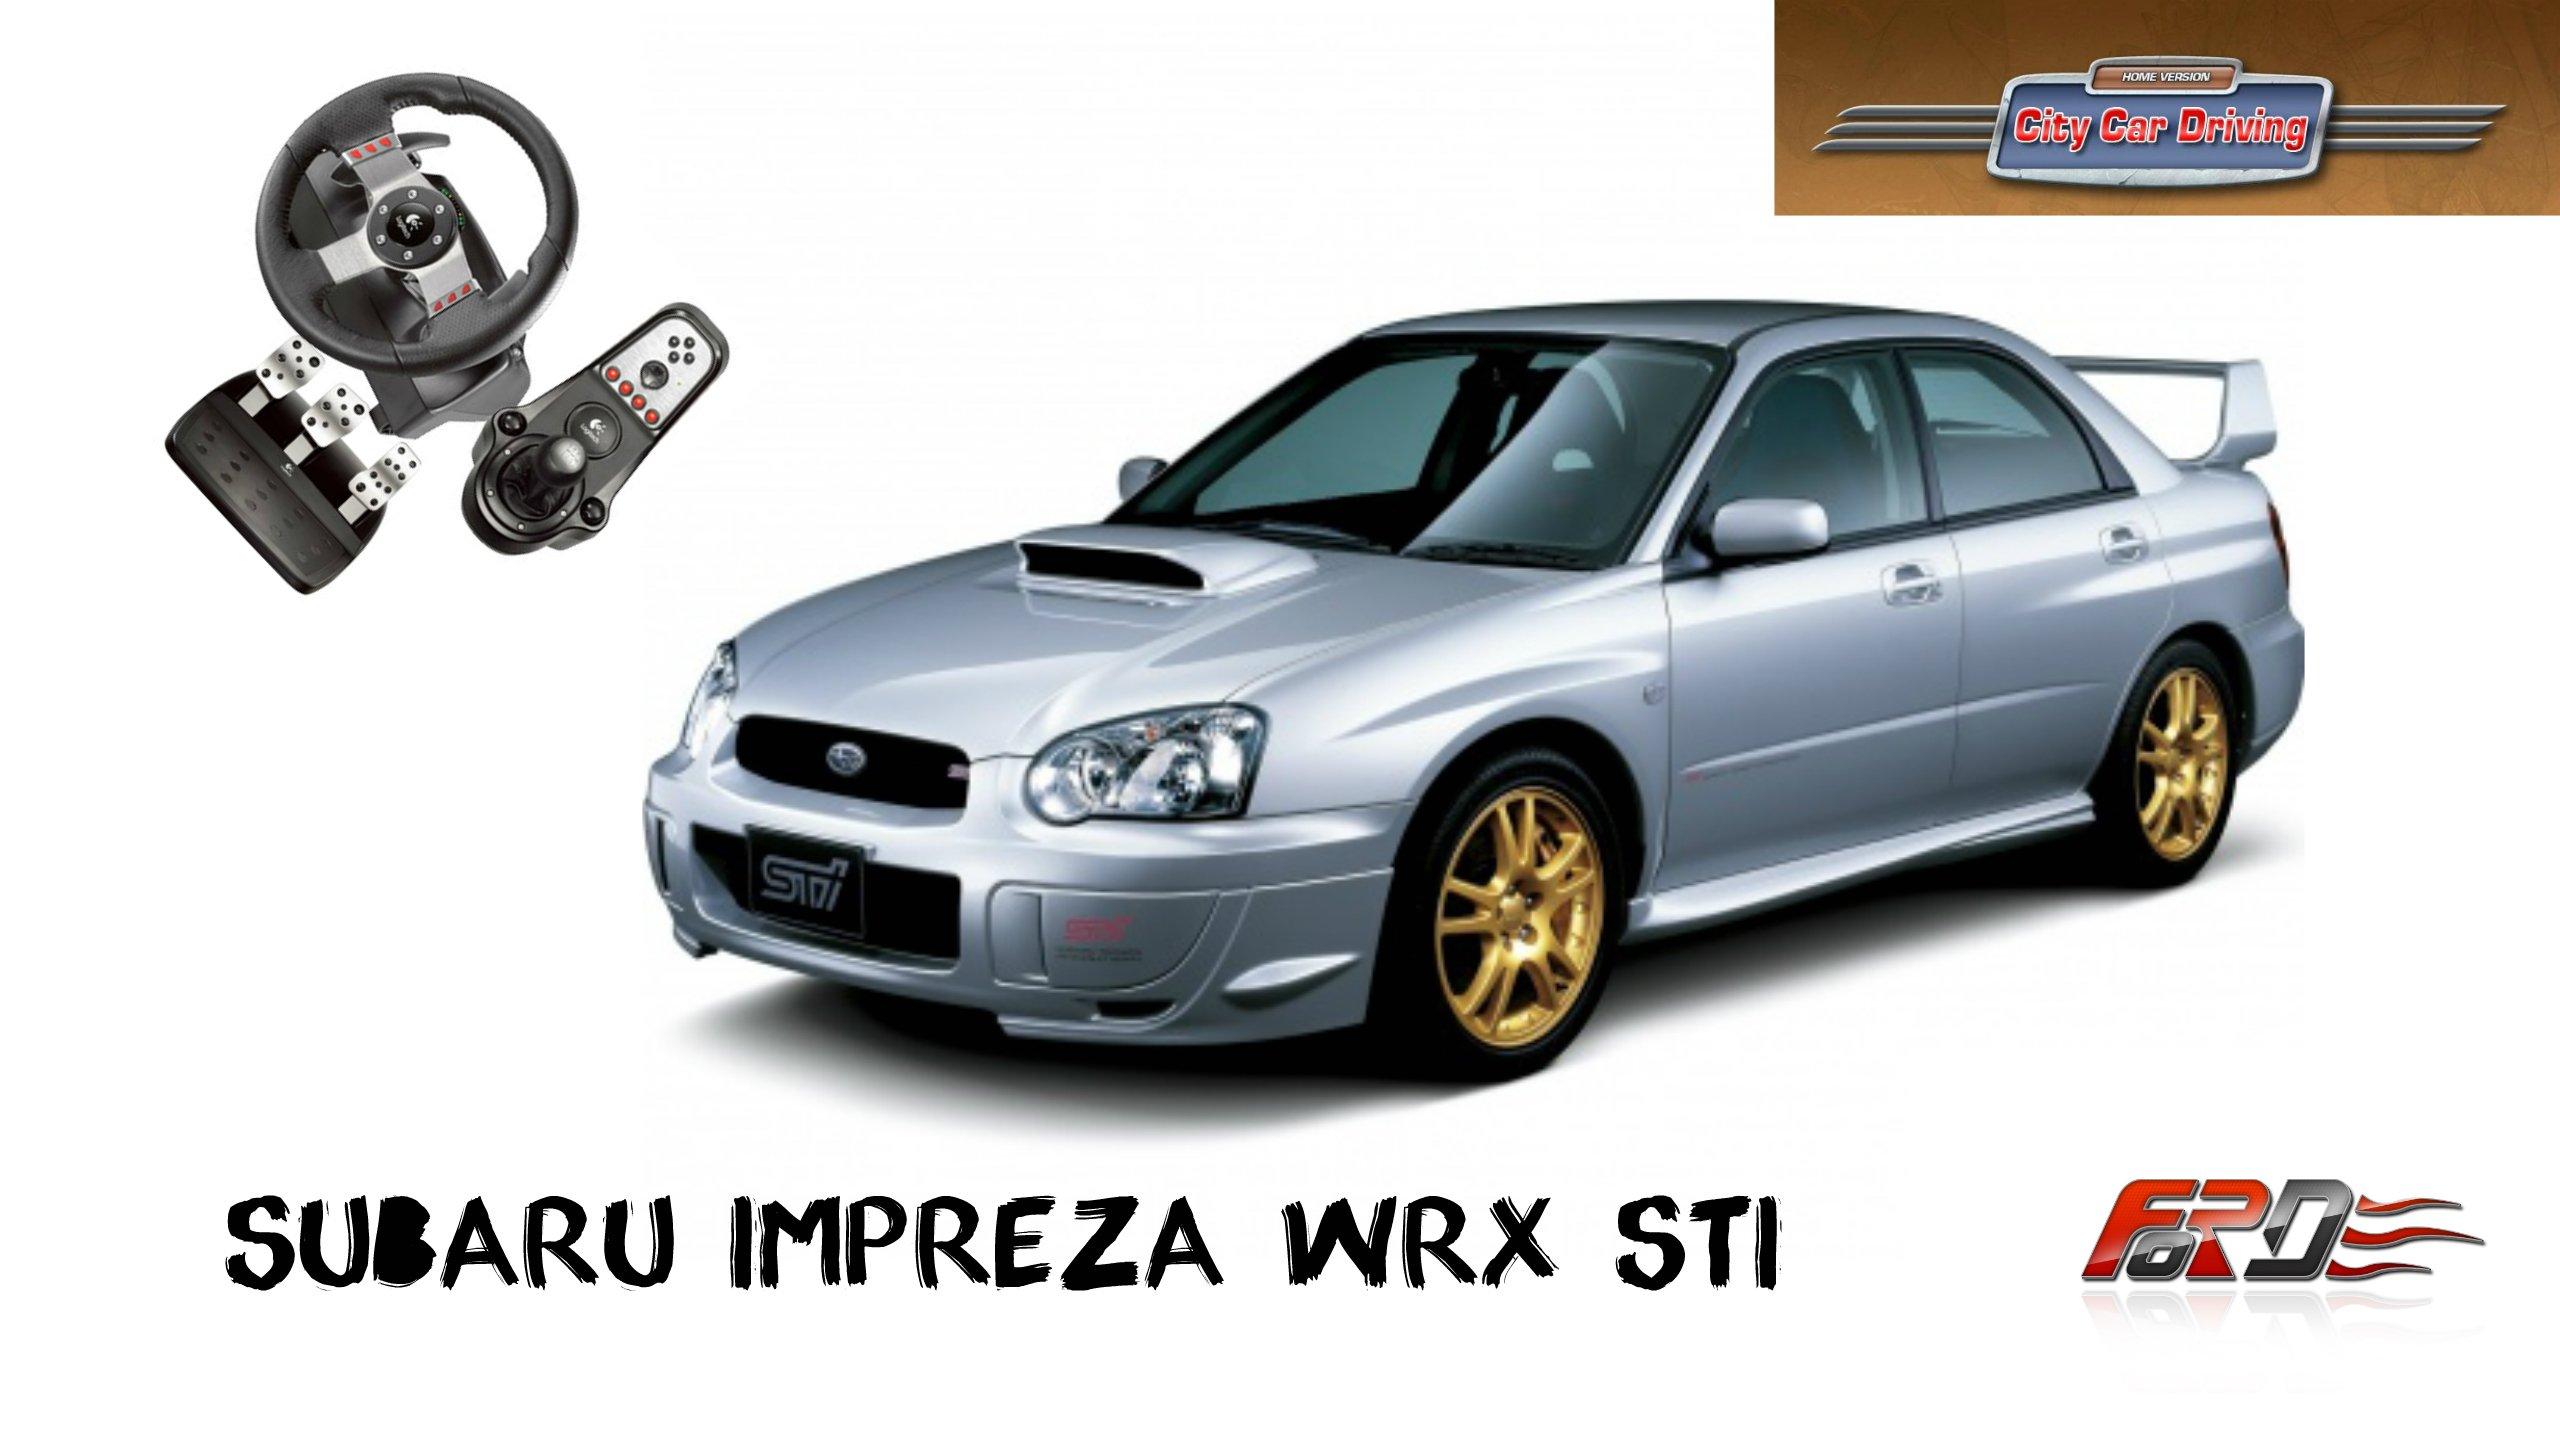 Subaru Impreza WRX STI тест-драйв, обзор, разгон, динамика в City Car Driving - Изображение 1